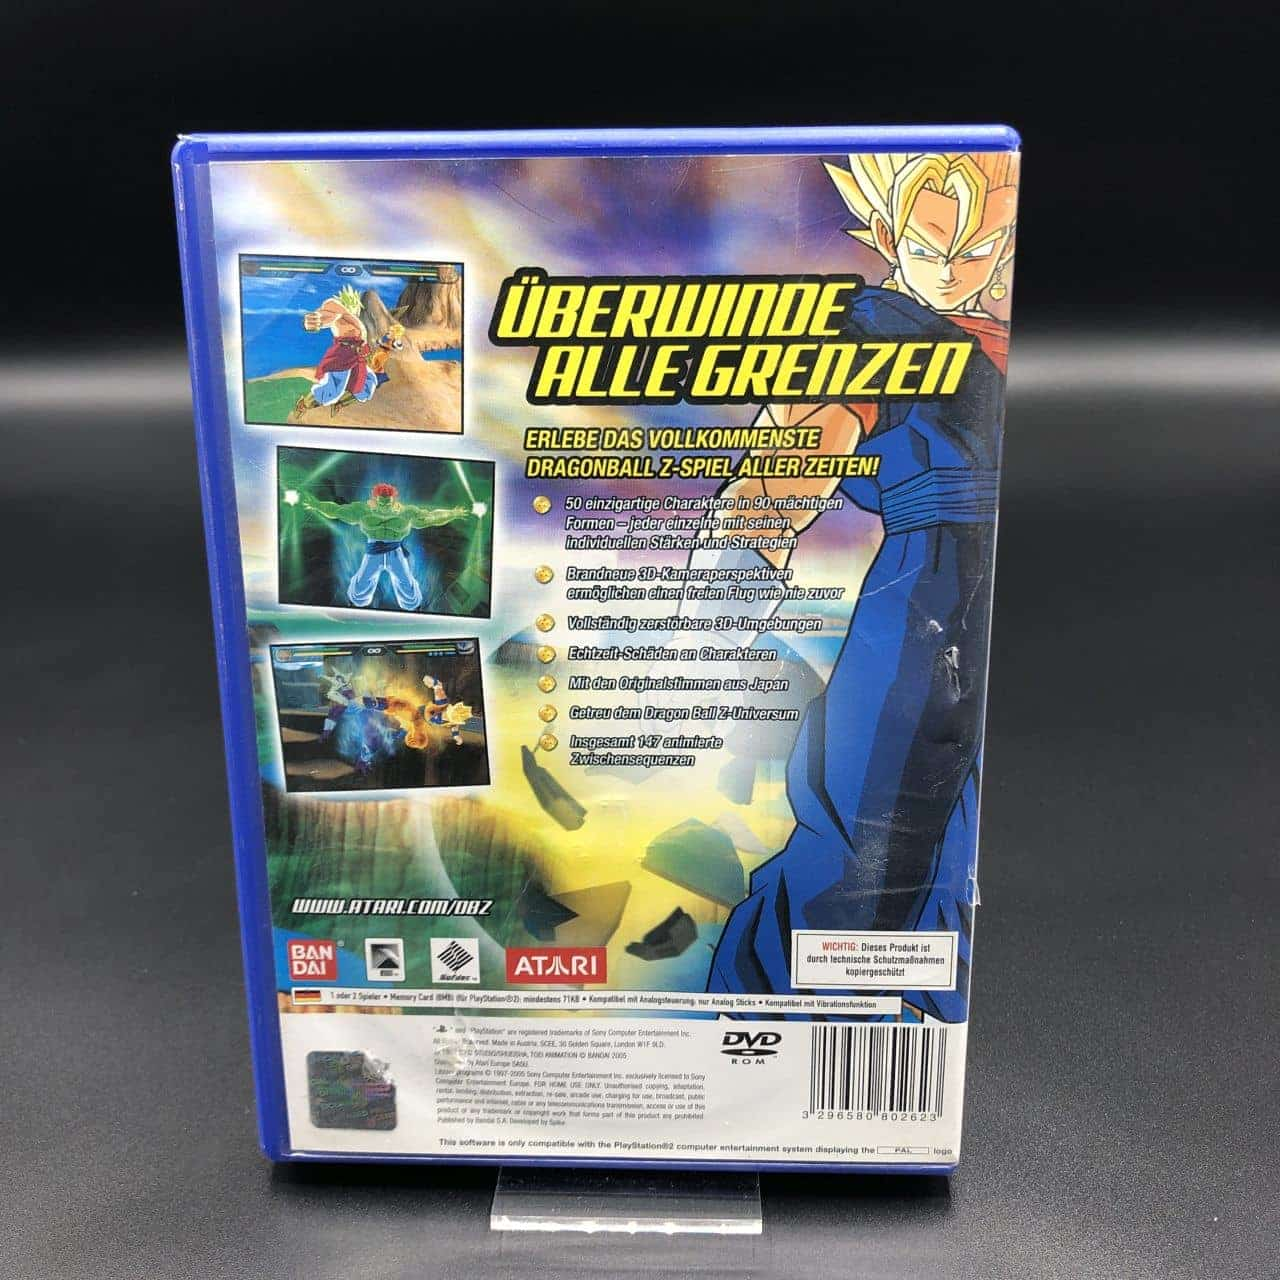 PS2 Dragon Ball Z: Budokai Tenkaichi (Komplett) (Gebrauchsspuren) Sony PlayStation 2